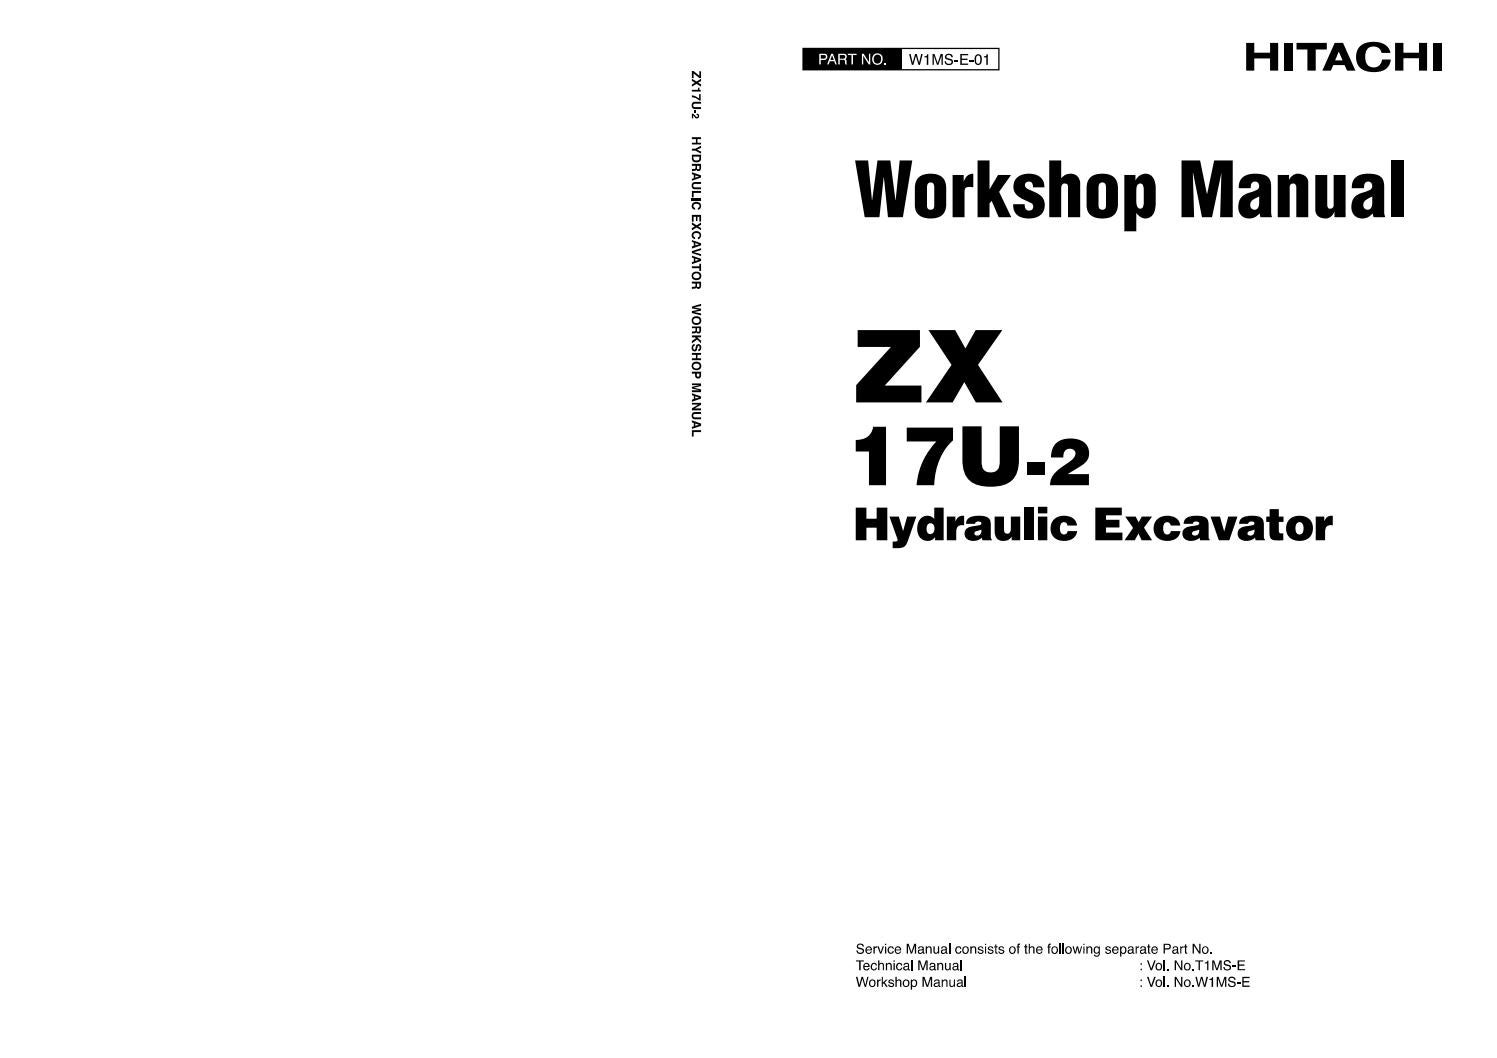 HITACHI ZAXIS ZX 17U-2 EXCAVATOR Service Repair Manual by